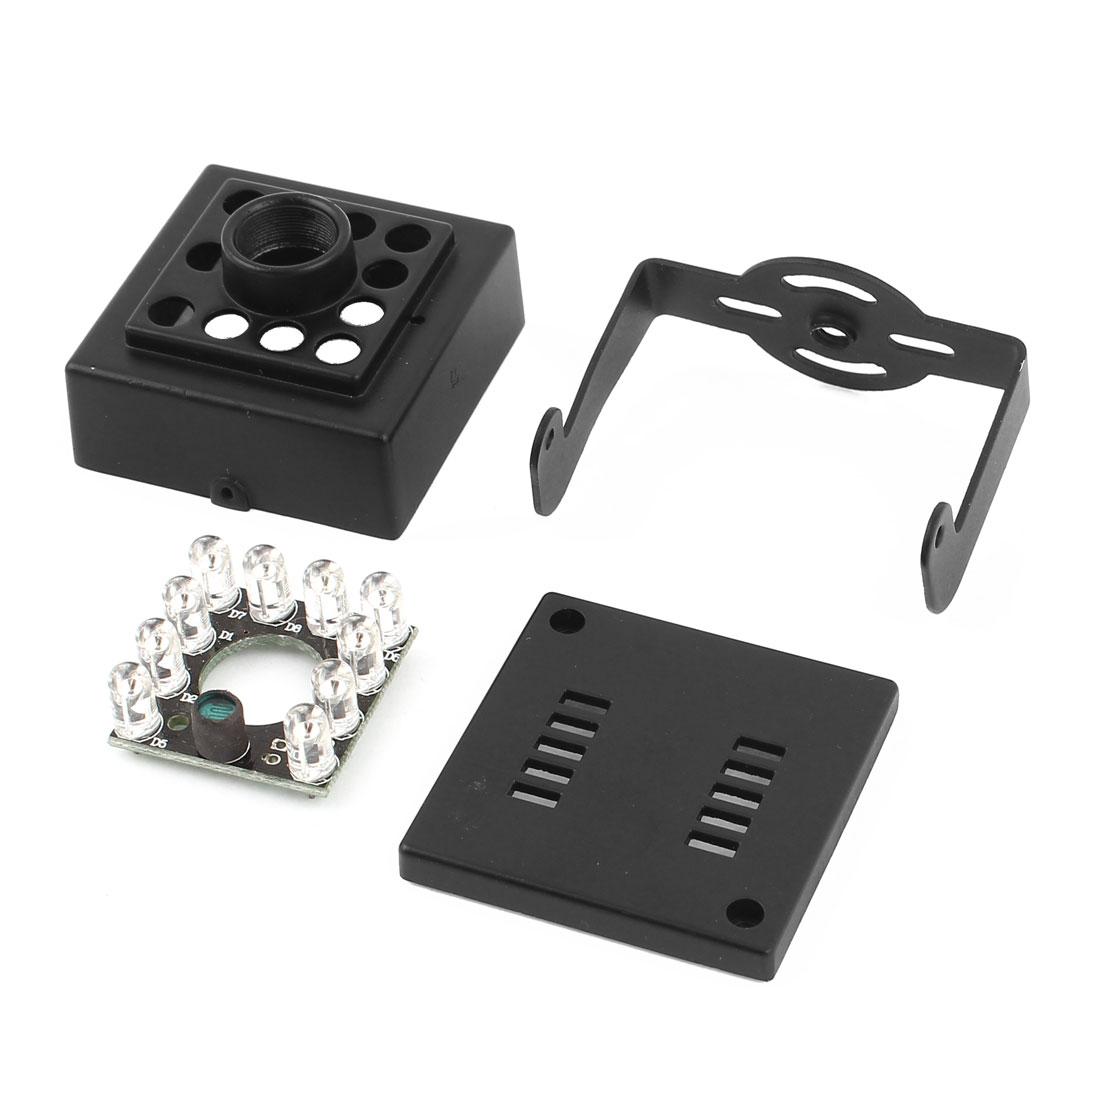 HD46A Black Metal CCTV Camera Enclosure Box Housing M12 w IR LED Board